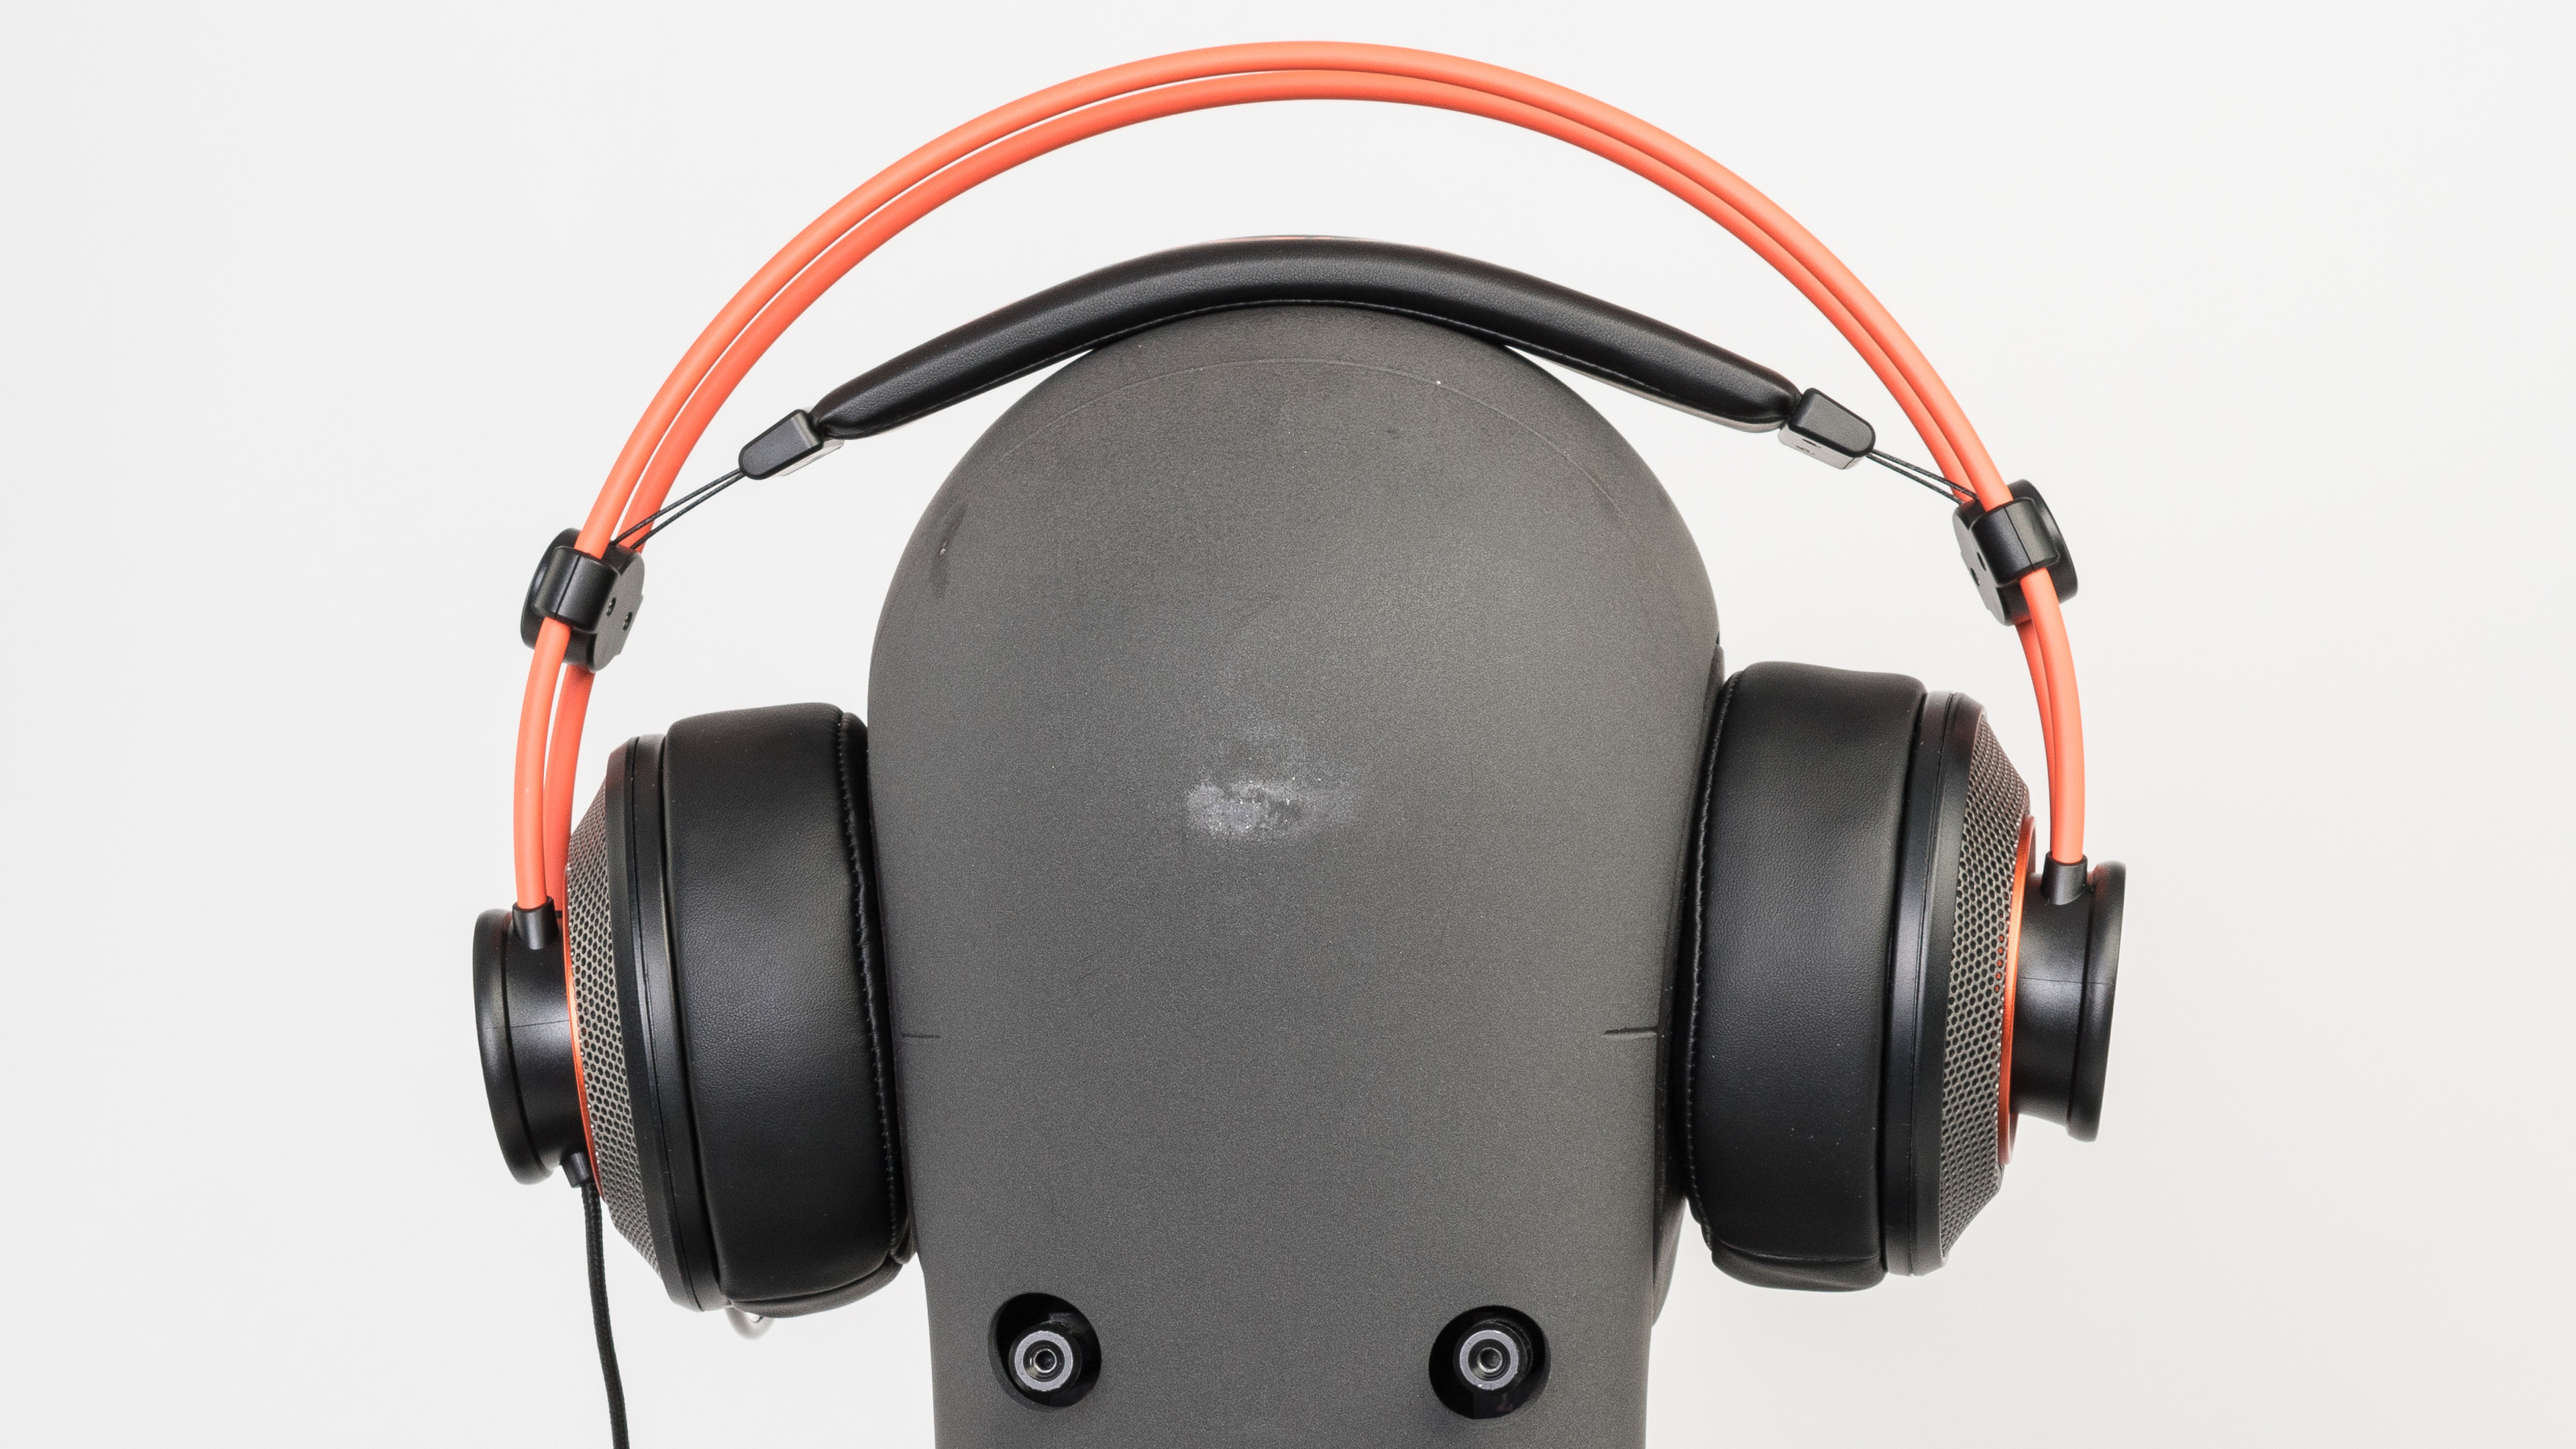 Fancy G430 Headset Wiring Diagram Elaboration - Everything You Need ...